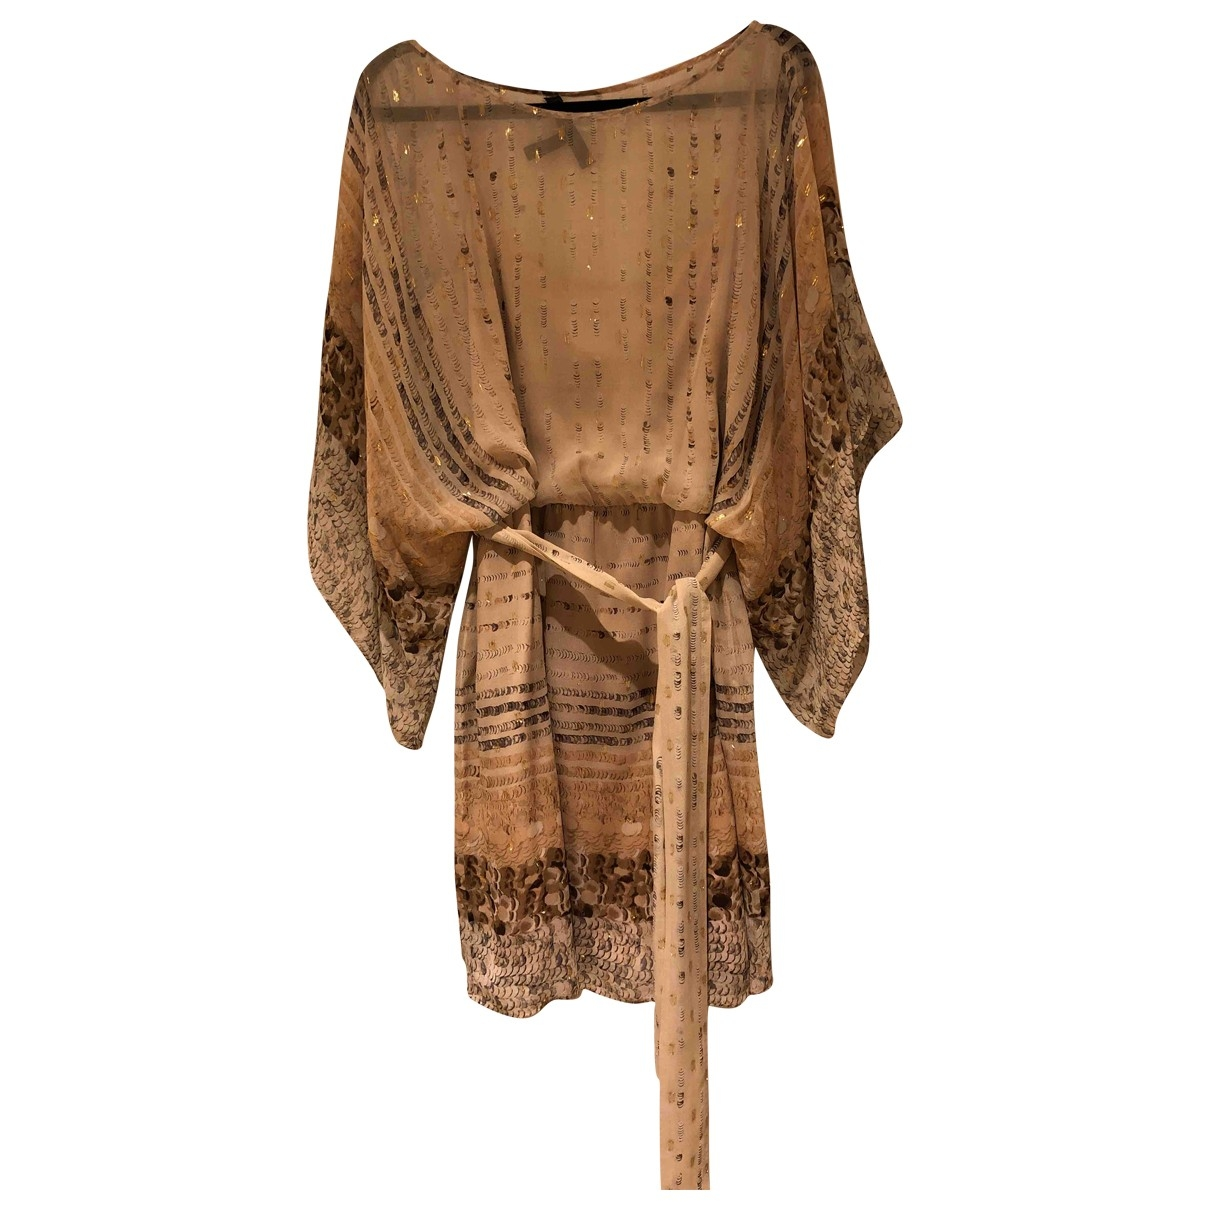 Bcbg Max Azria \N Beige Cotton dress for Women L International